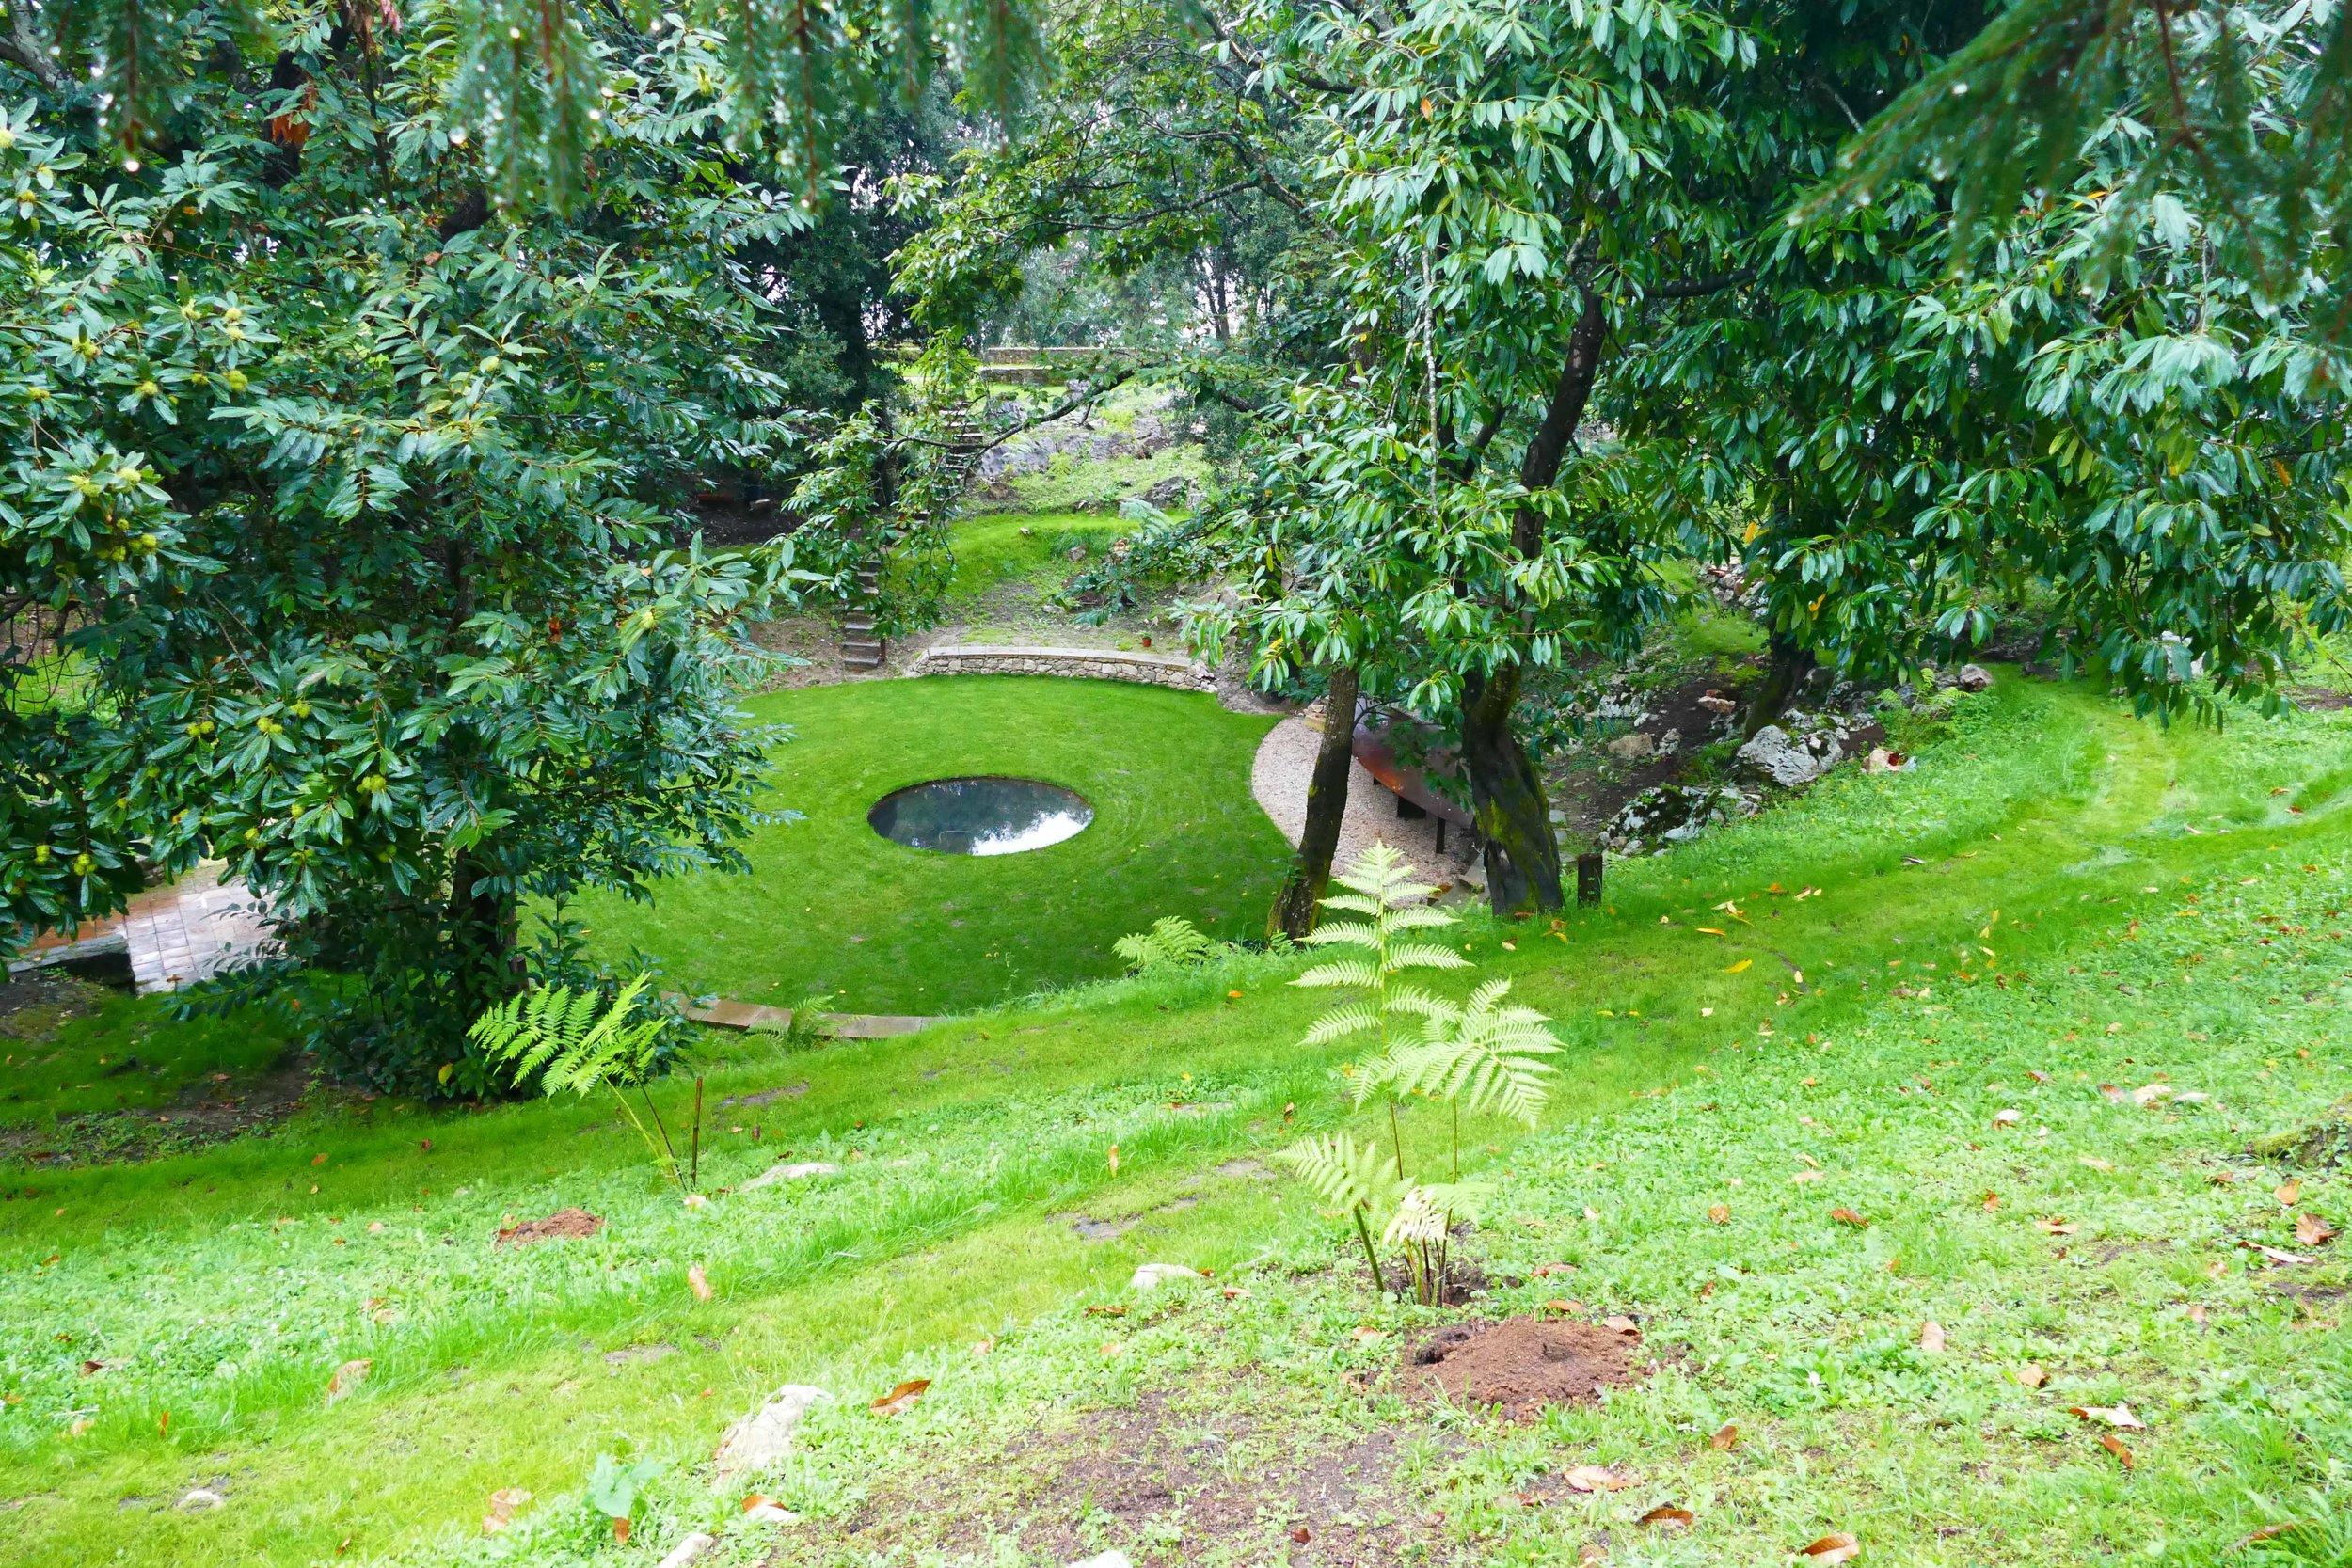 Dinosaurs Garden